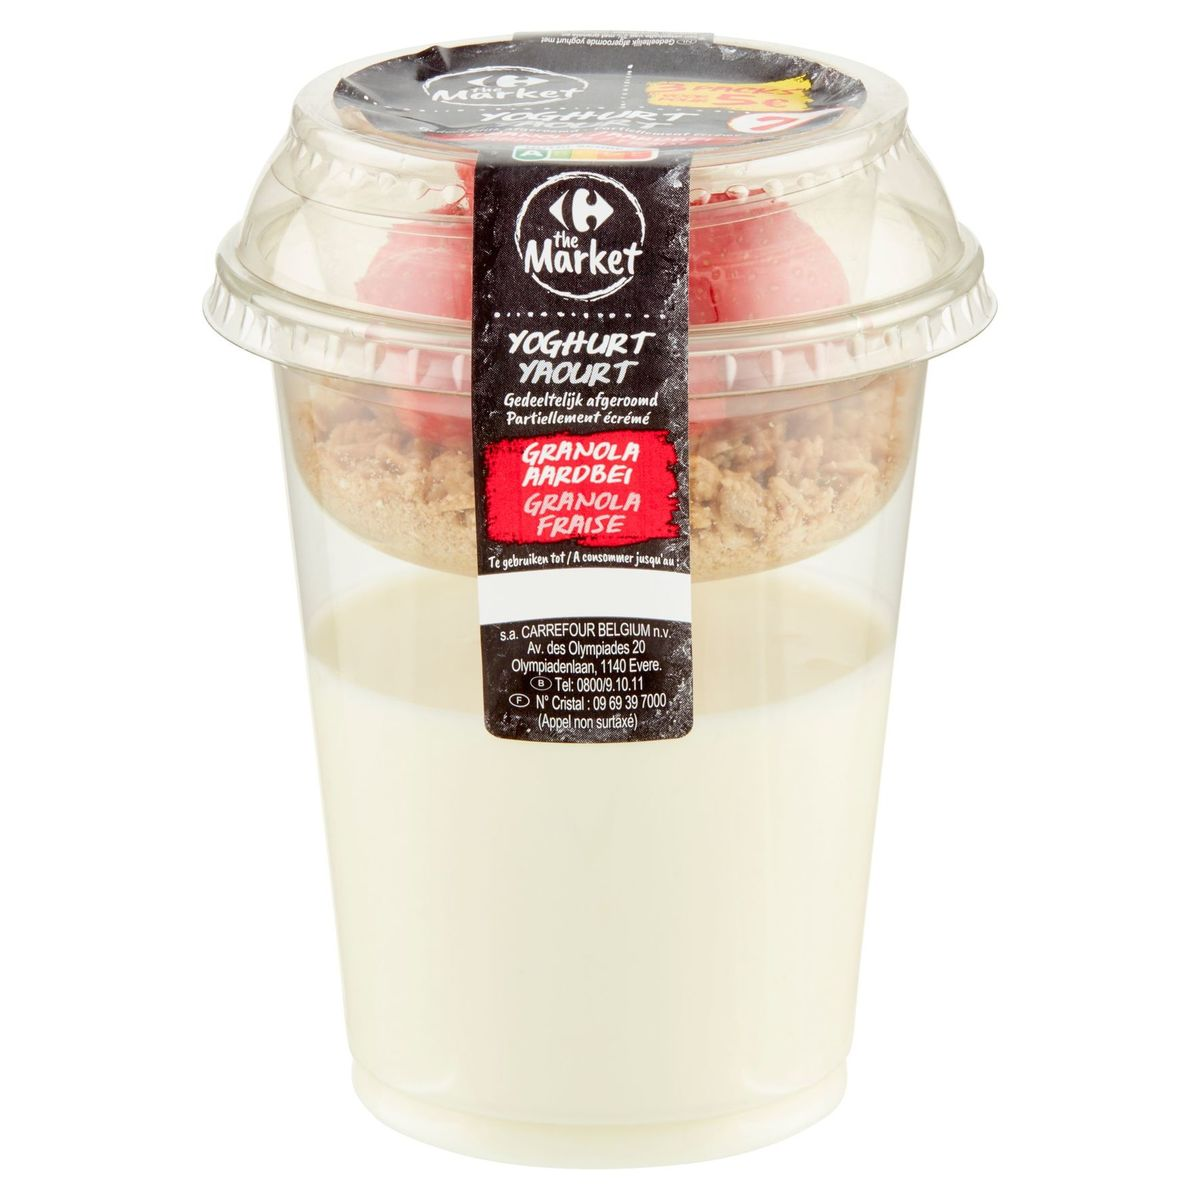 Carrefour The Market Yoghurt Afgeroomd Granola Aardbei 220 g